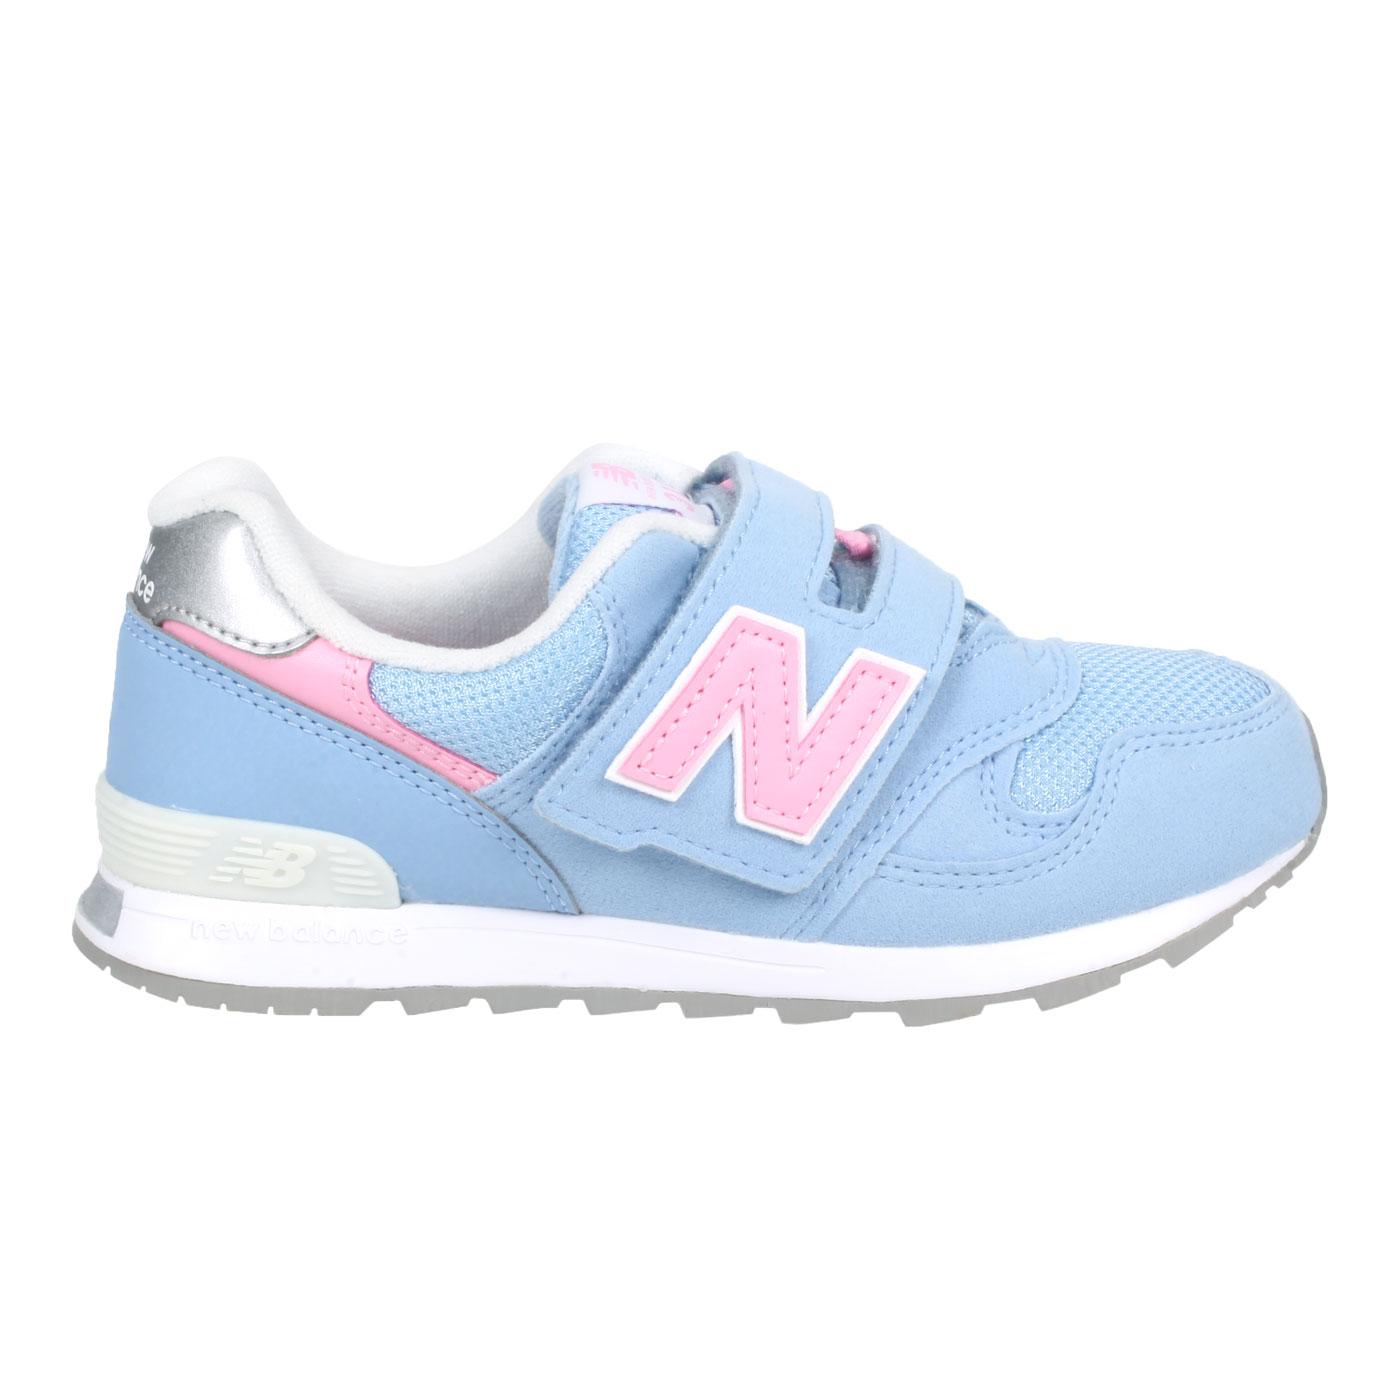 NEW BALANCE 中童休閒運動鞋 PO313UP - 藍粉銀